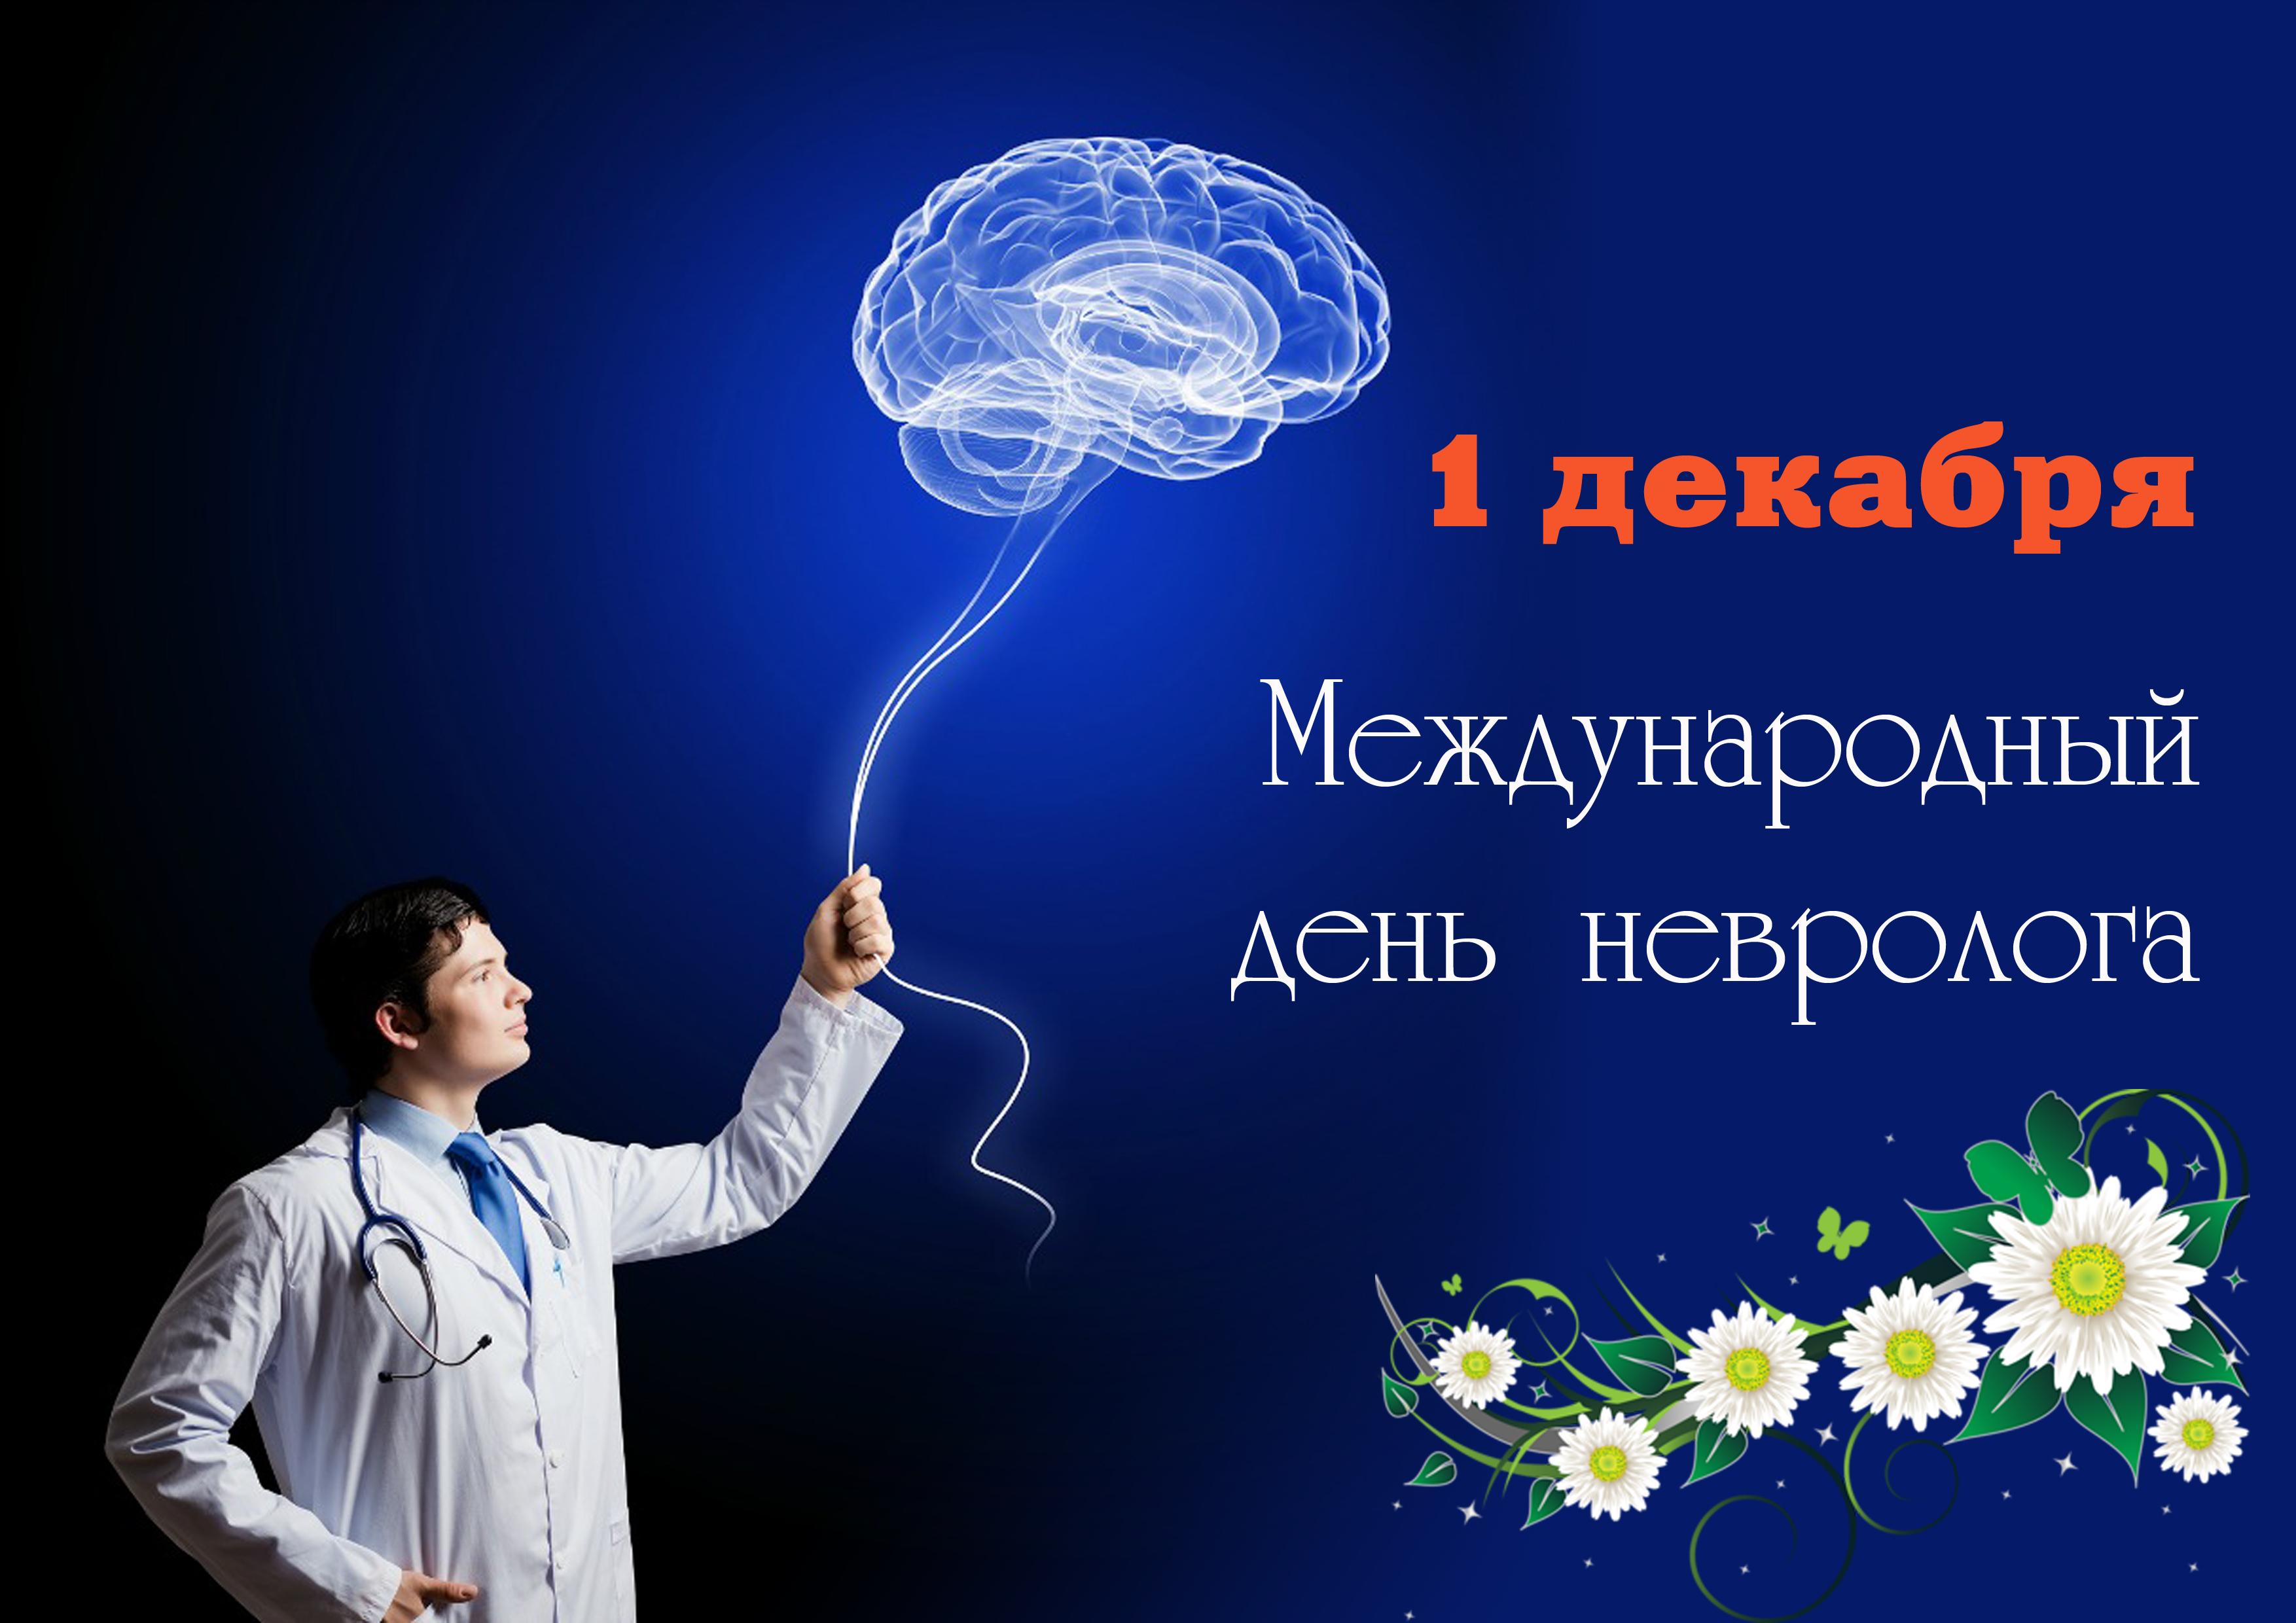 Прикольные картинки невролога, стишок для бабушки